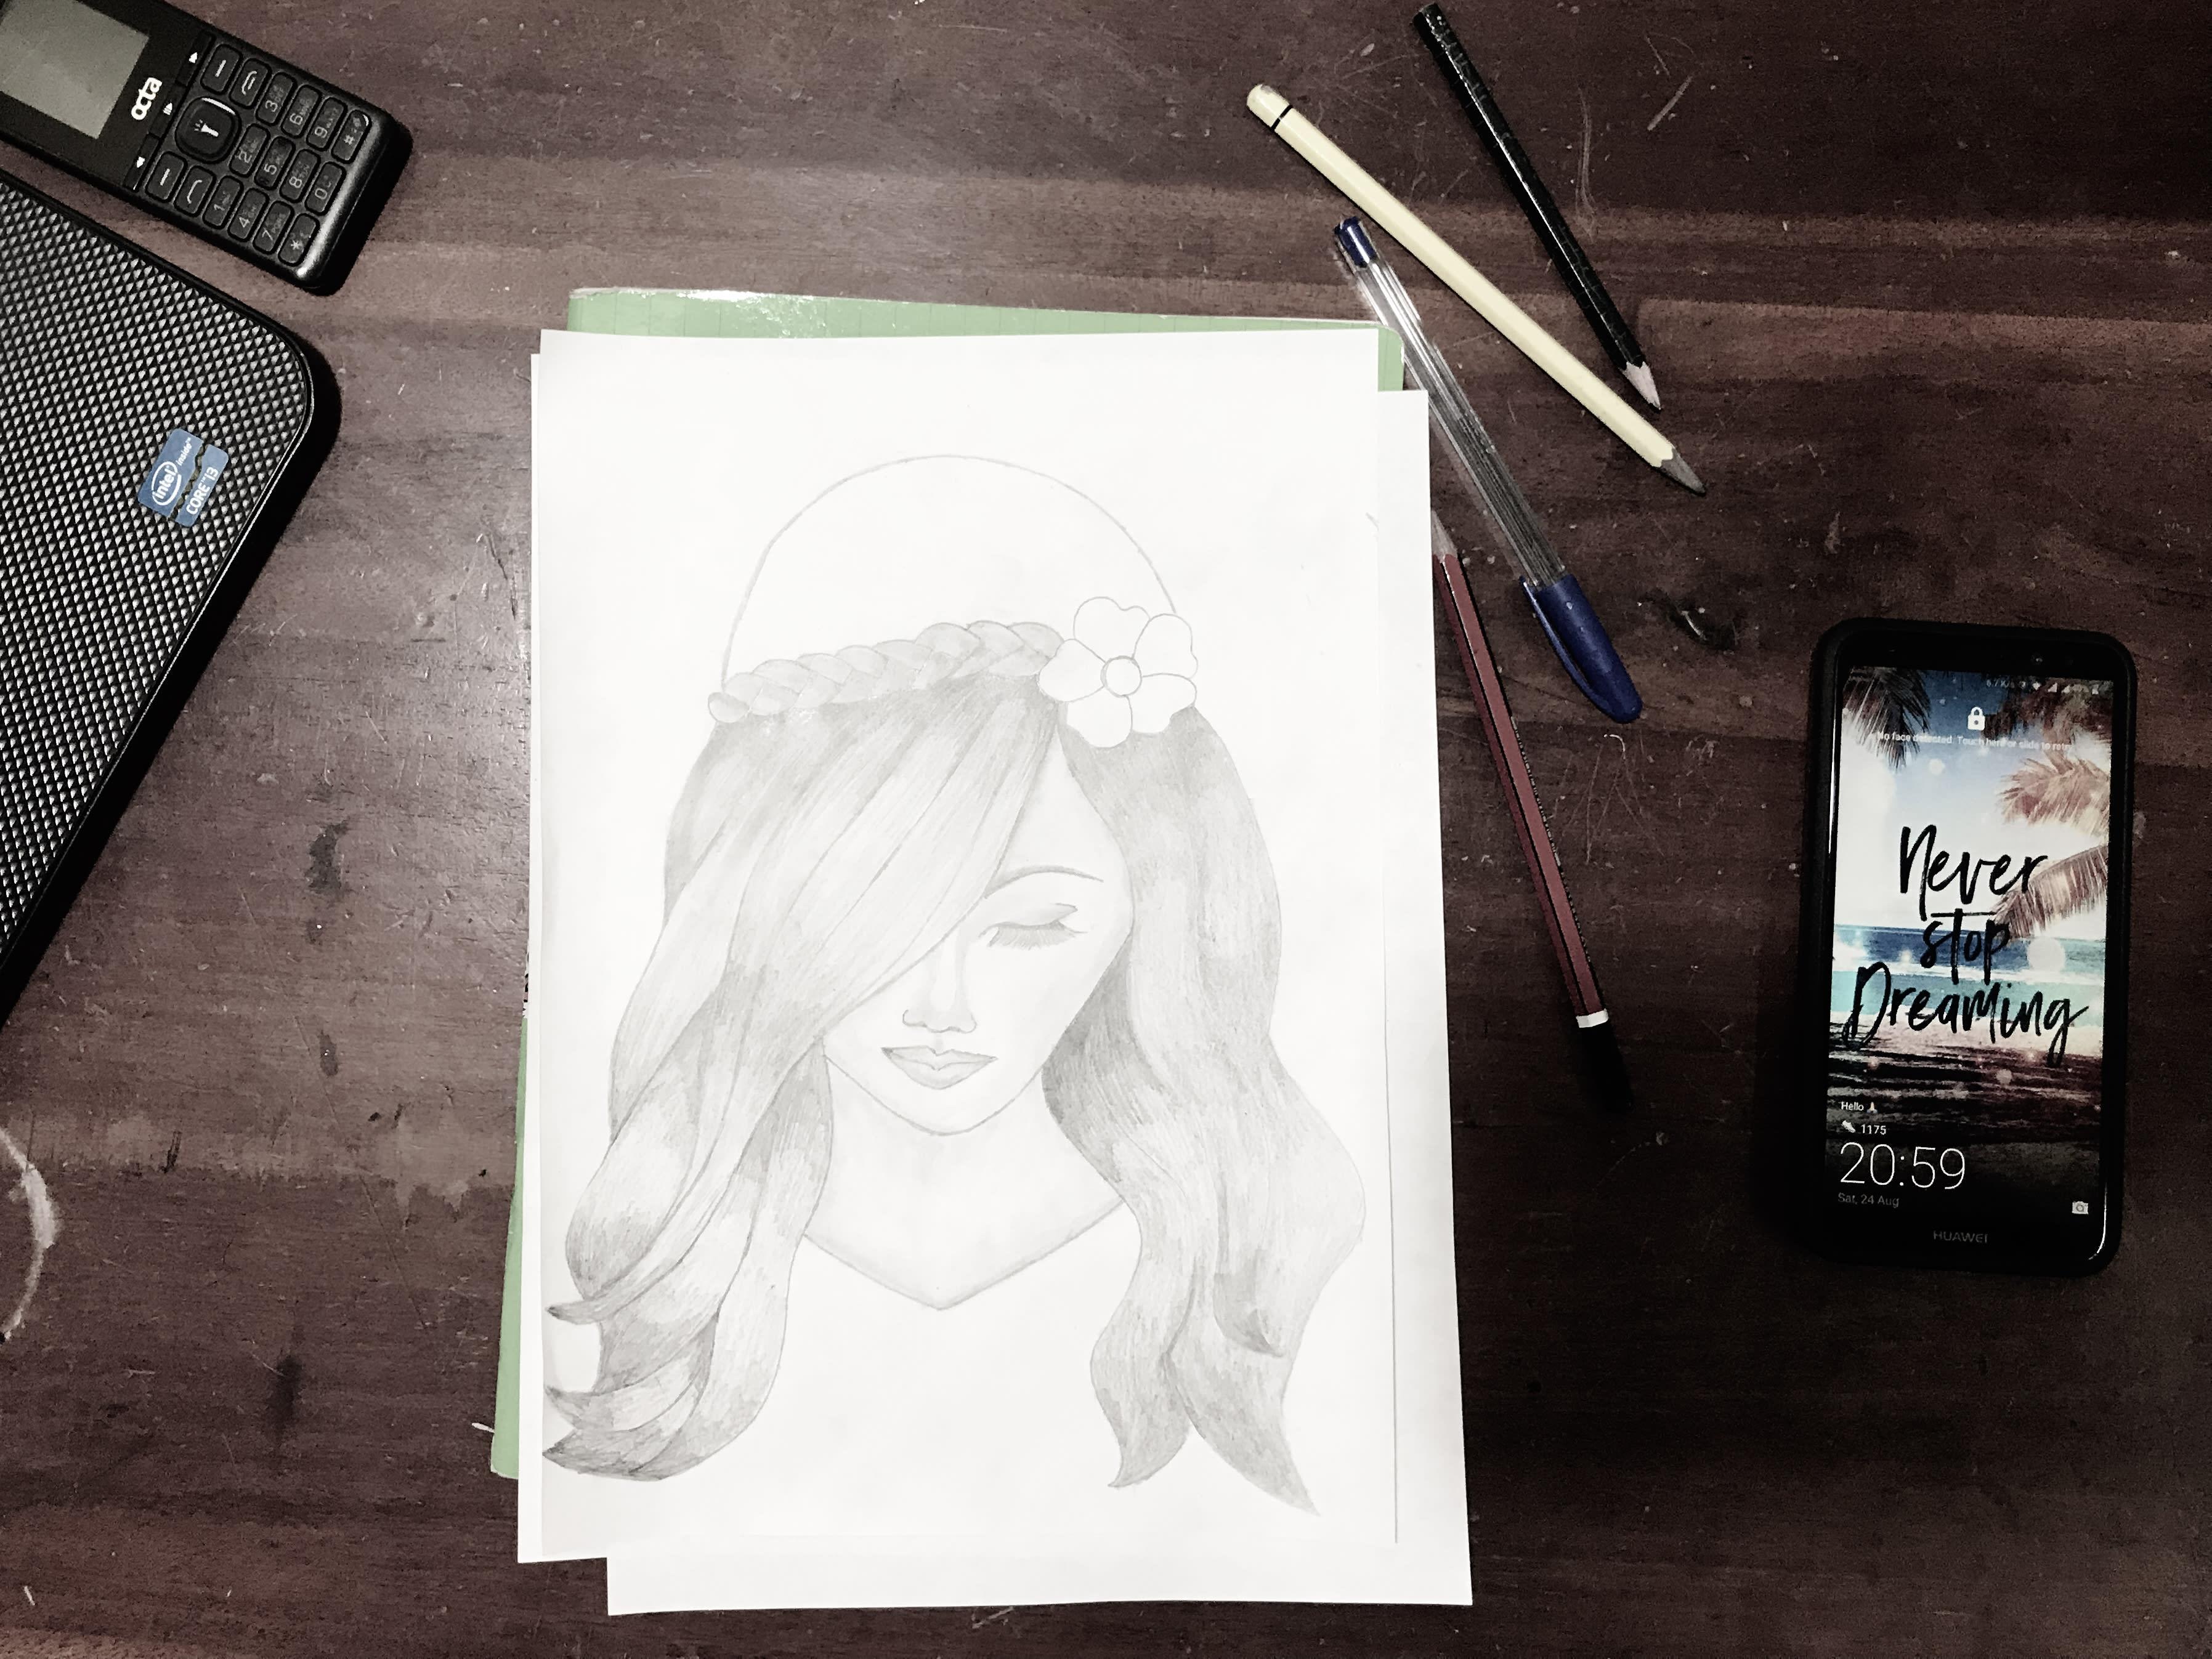 Draw A Pencil Sketch Pencil Painting Pencil Art By Dexter Genius